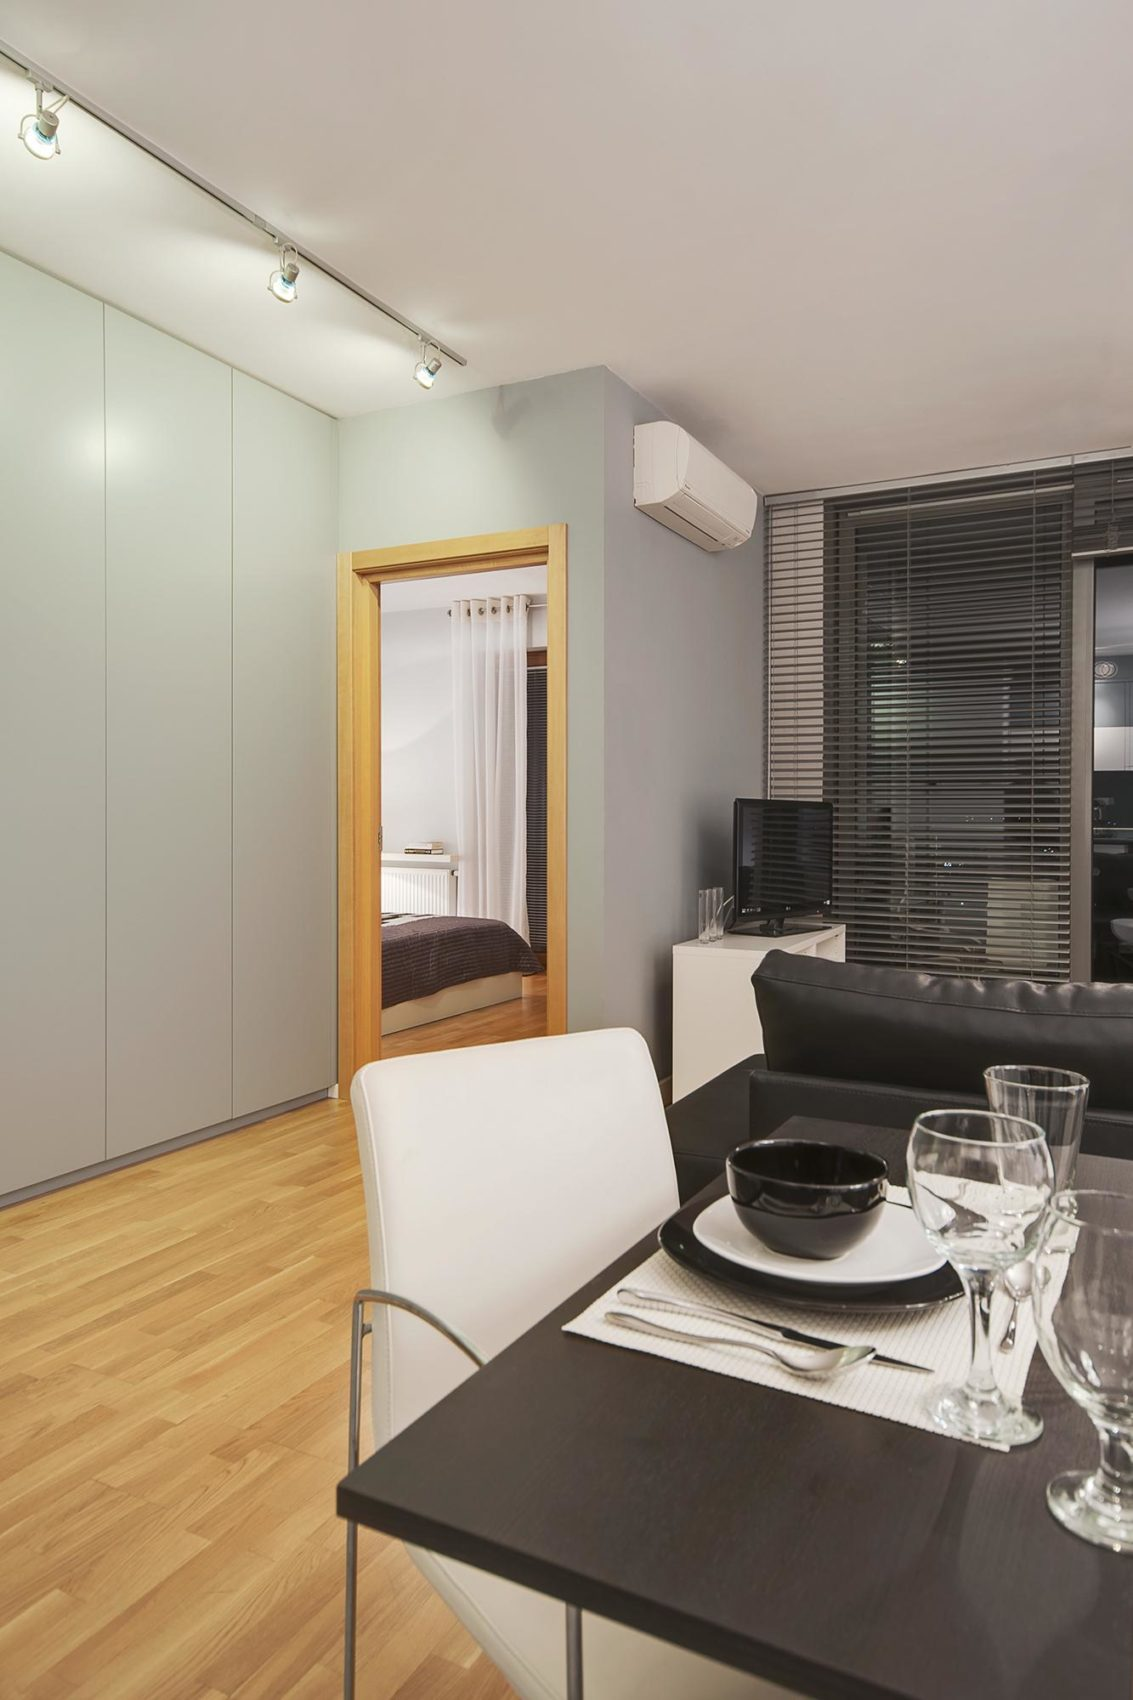 Wislane Tarasy Apartment in Krakow (5)